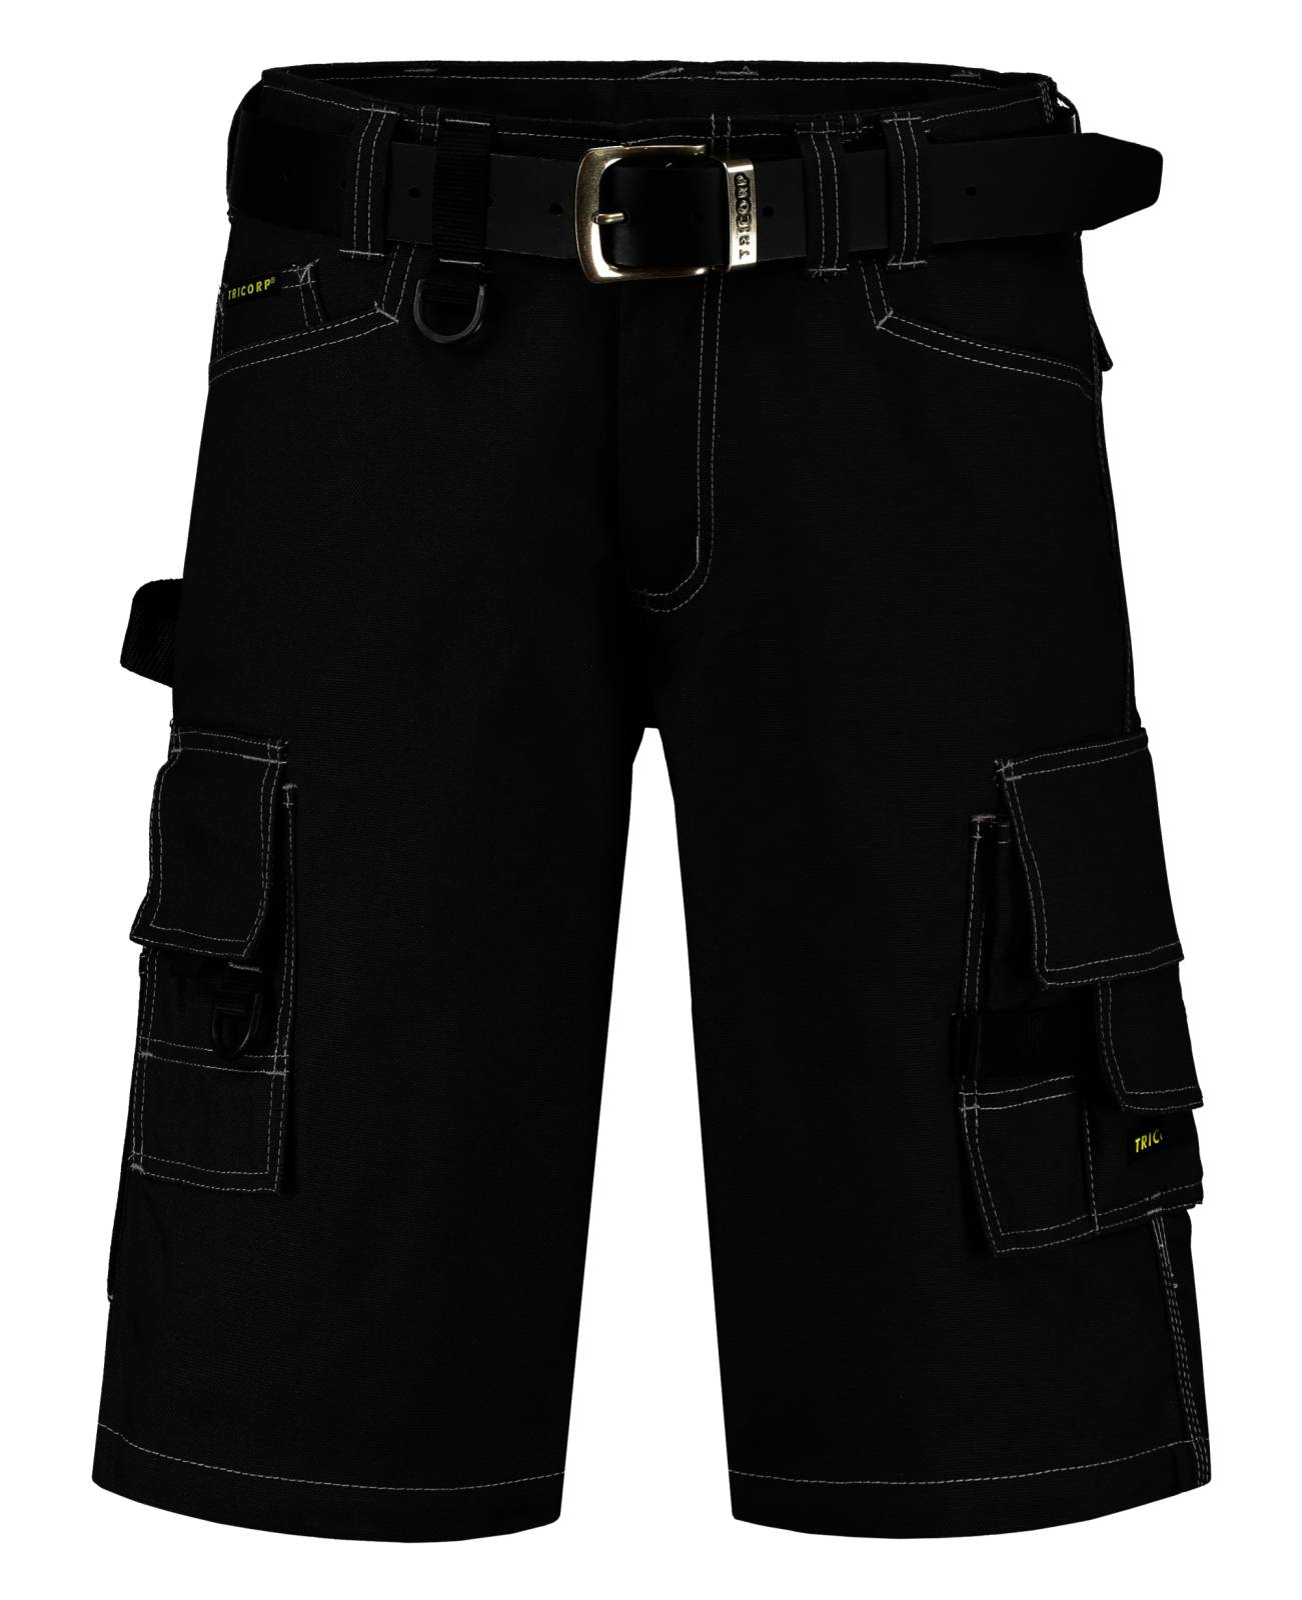 Tricorp Workwear Broeken 502006-TKC2000 Lage taille donkergrijs(DarkGrey)